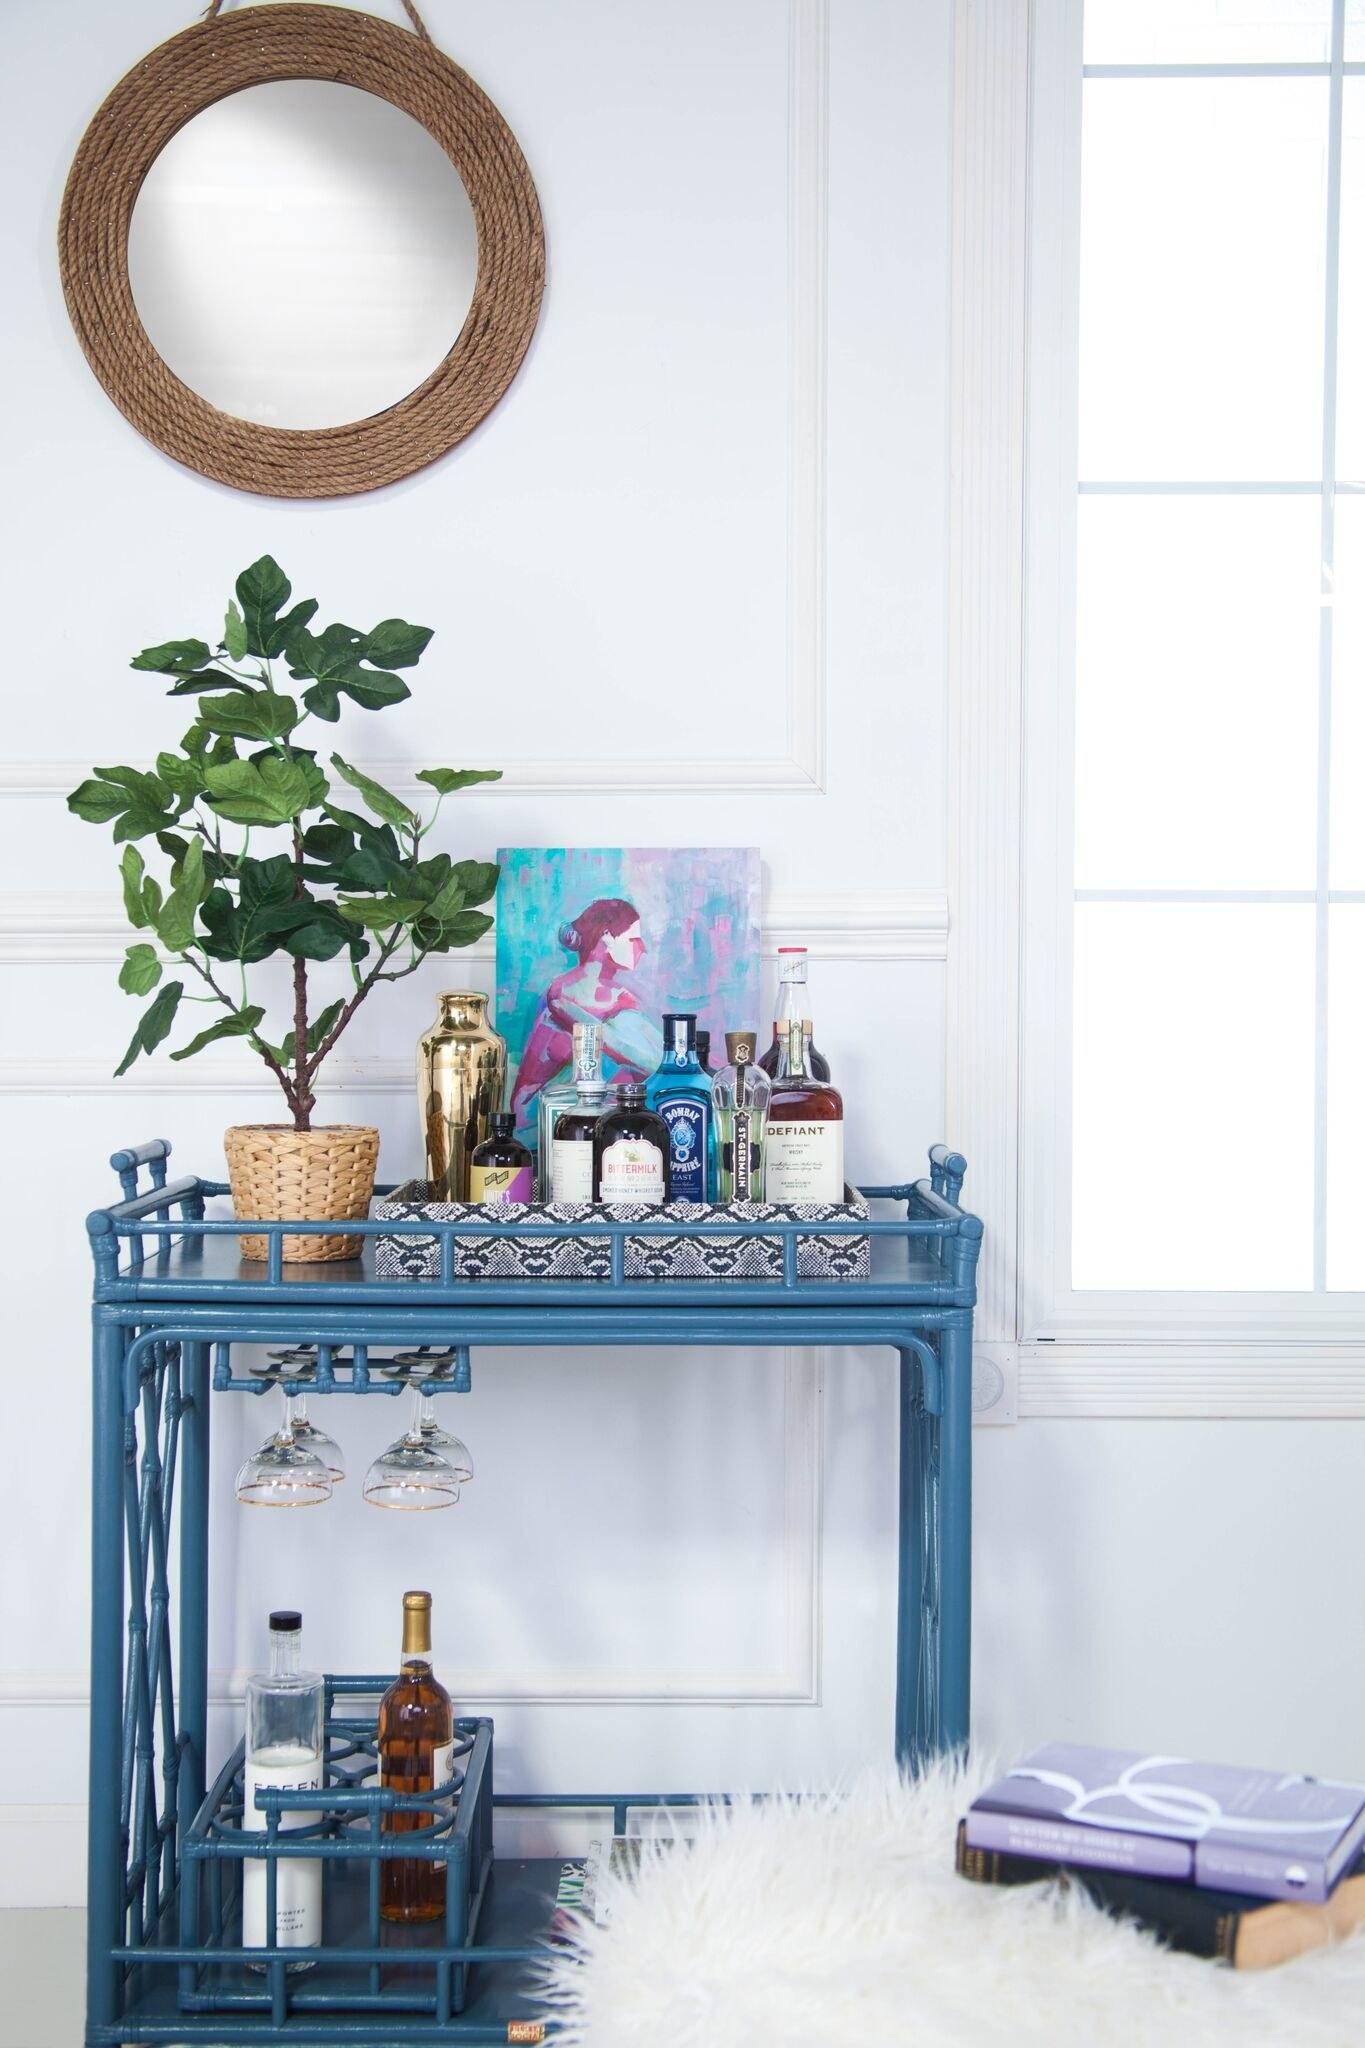 Blue bar cart in a white room